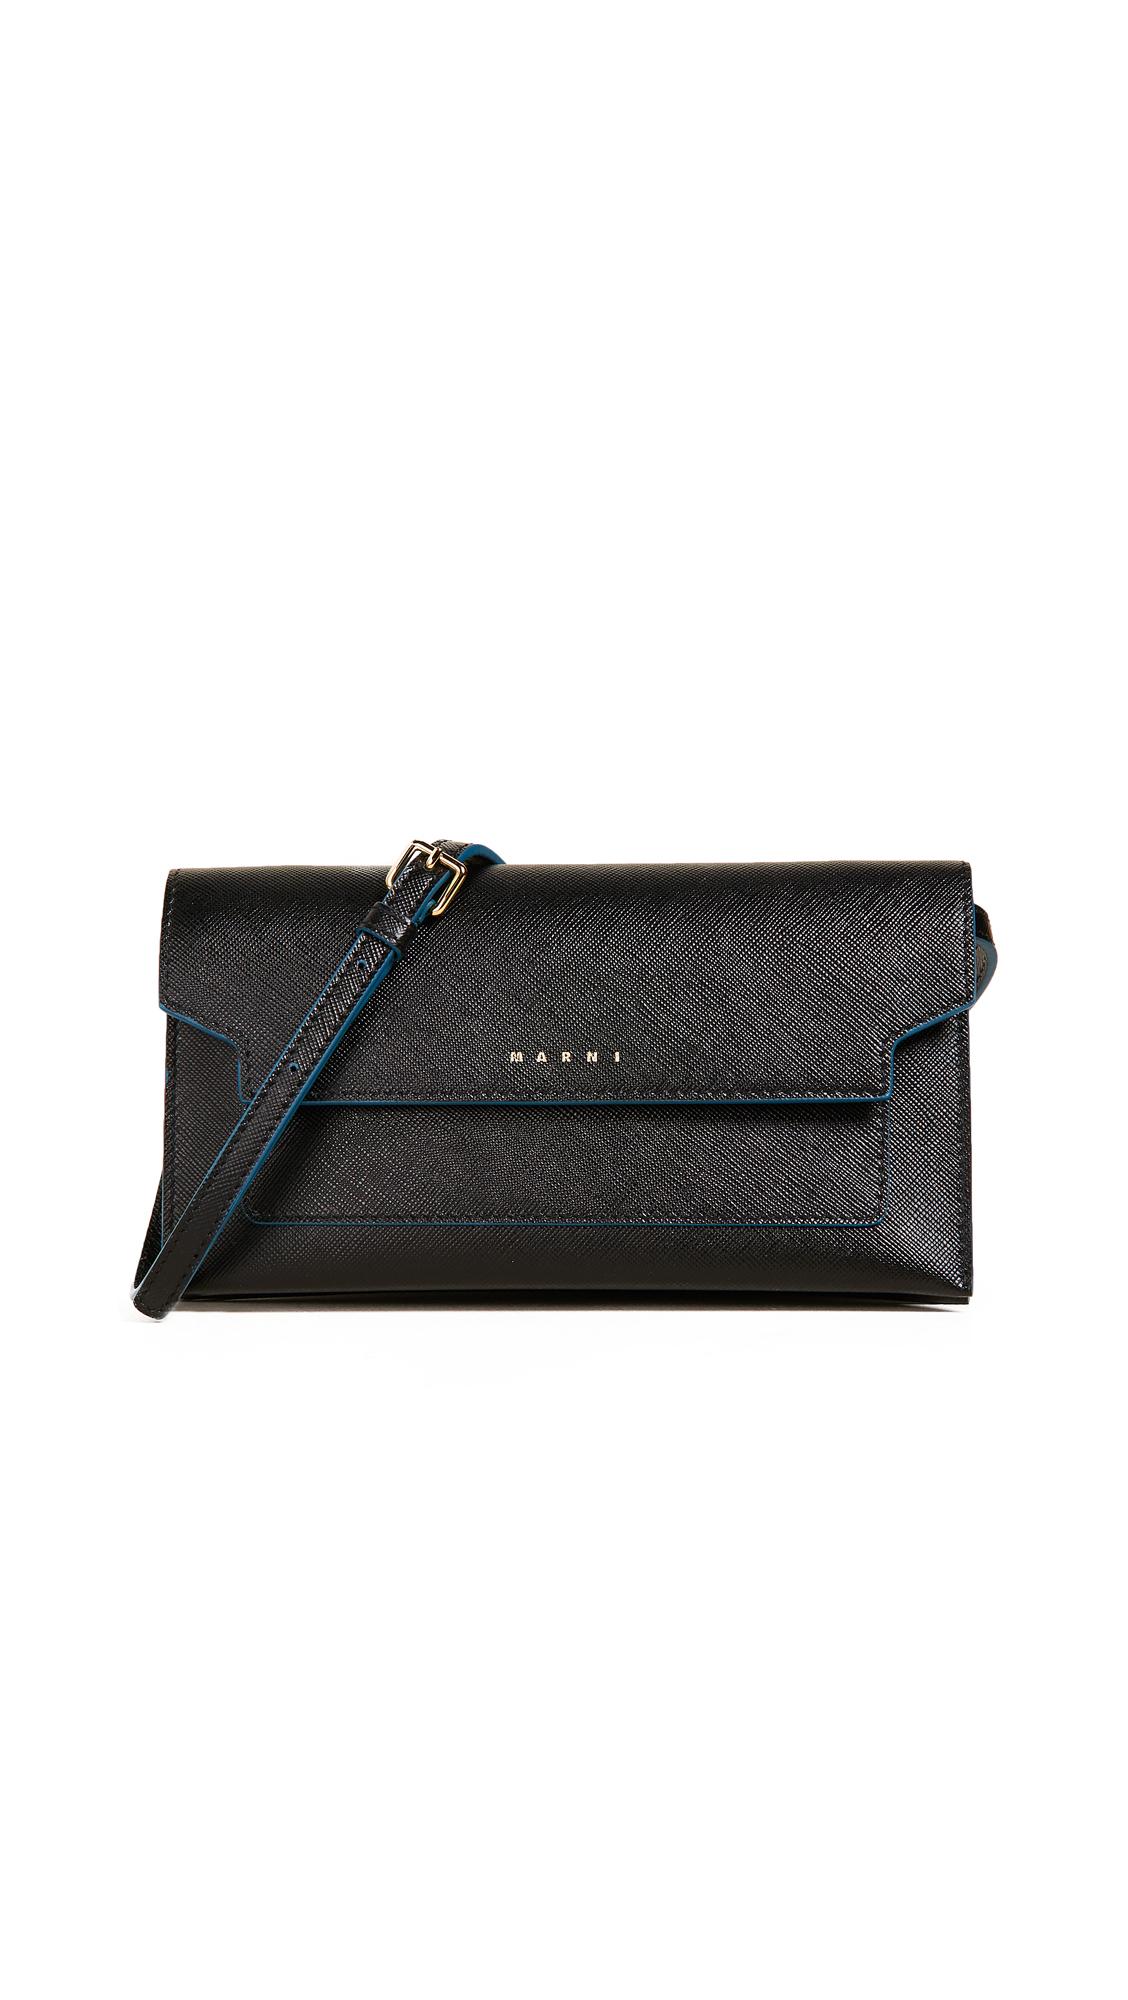 Marni Cross Body Wallet - Black/Gold Brown